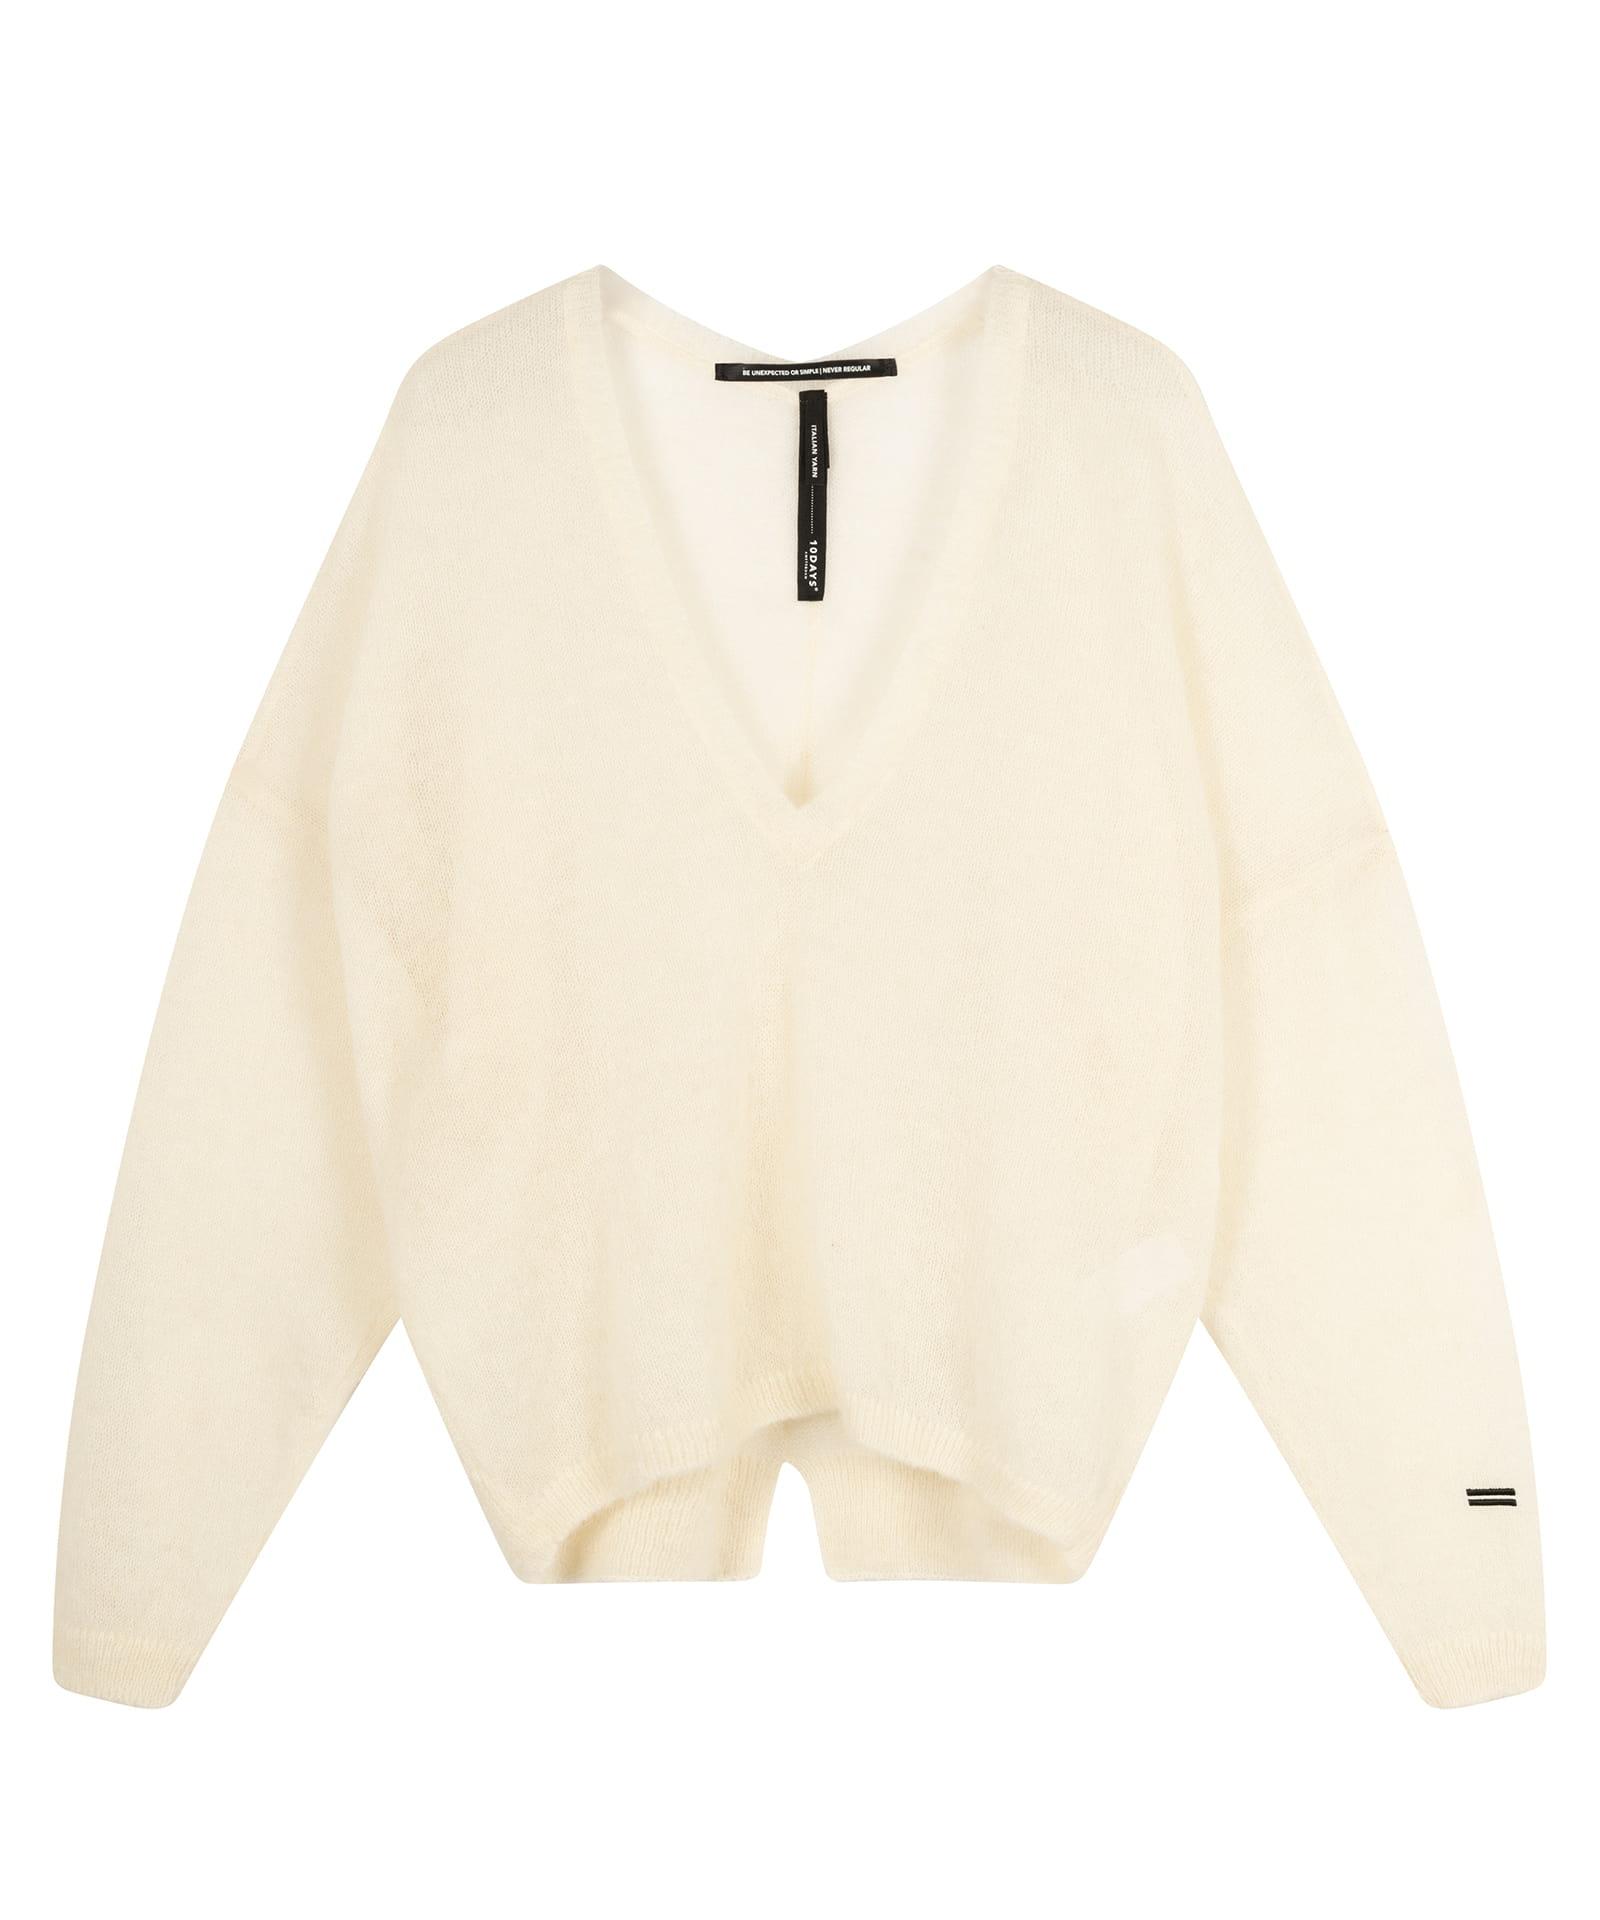 10 Days Thin Sweater V-Neck